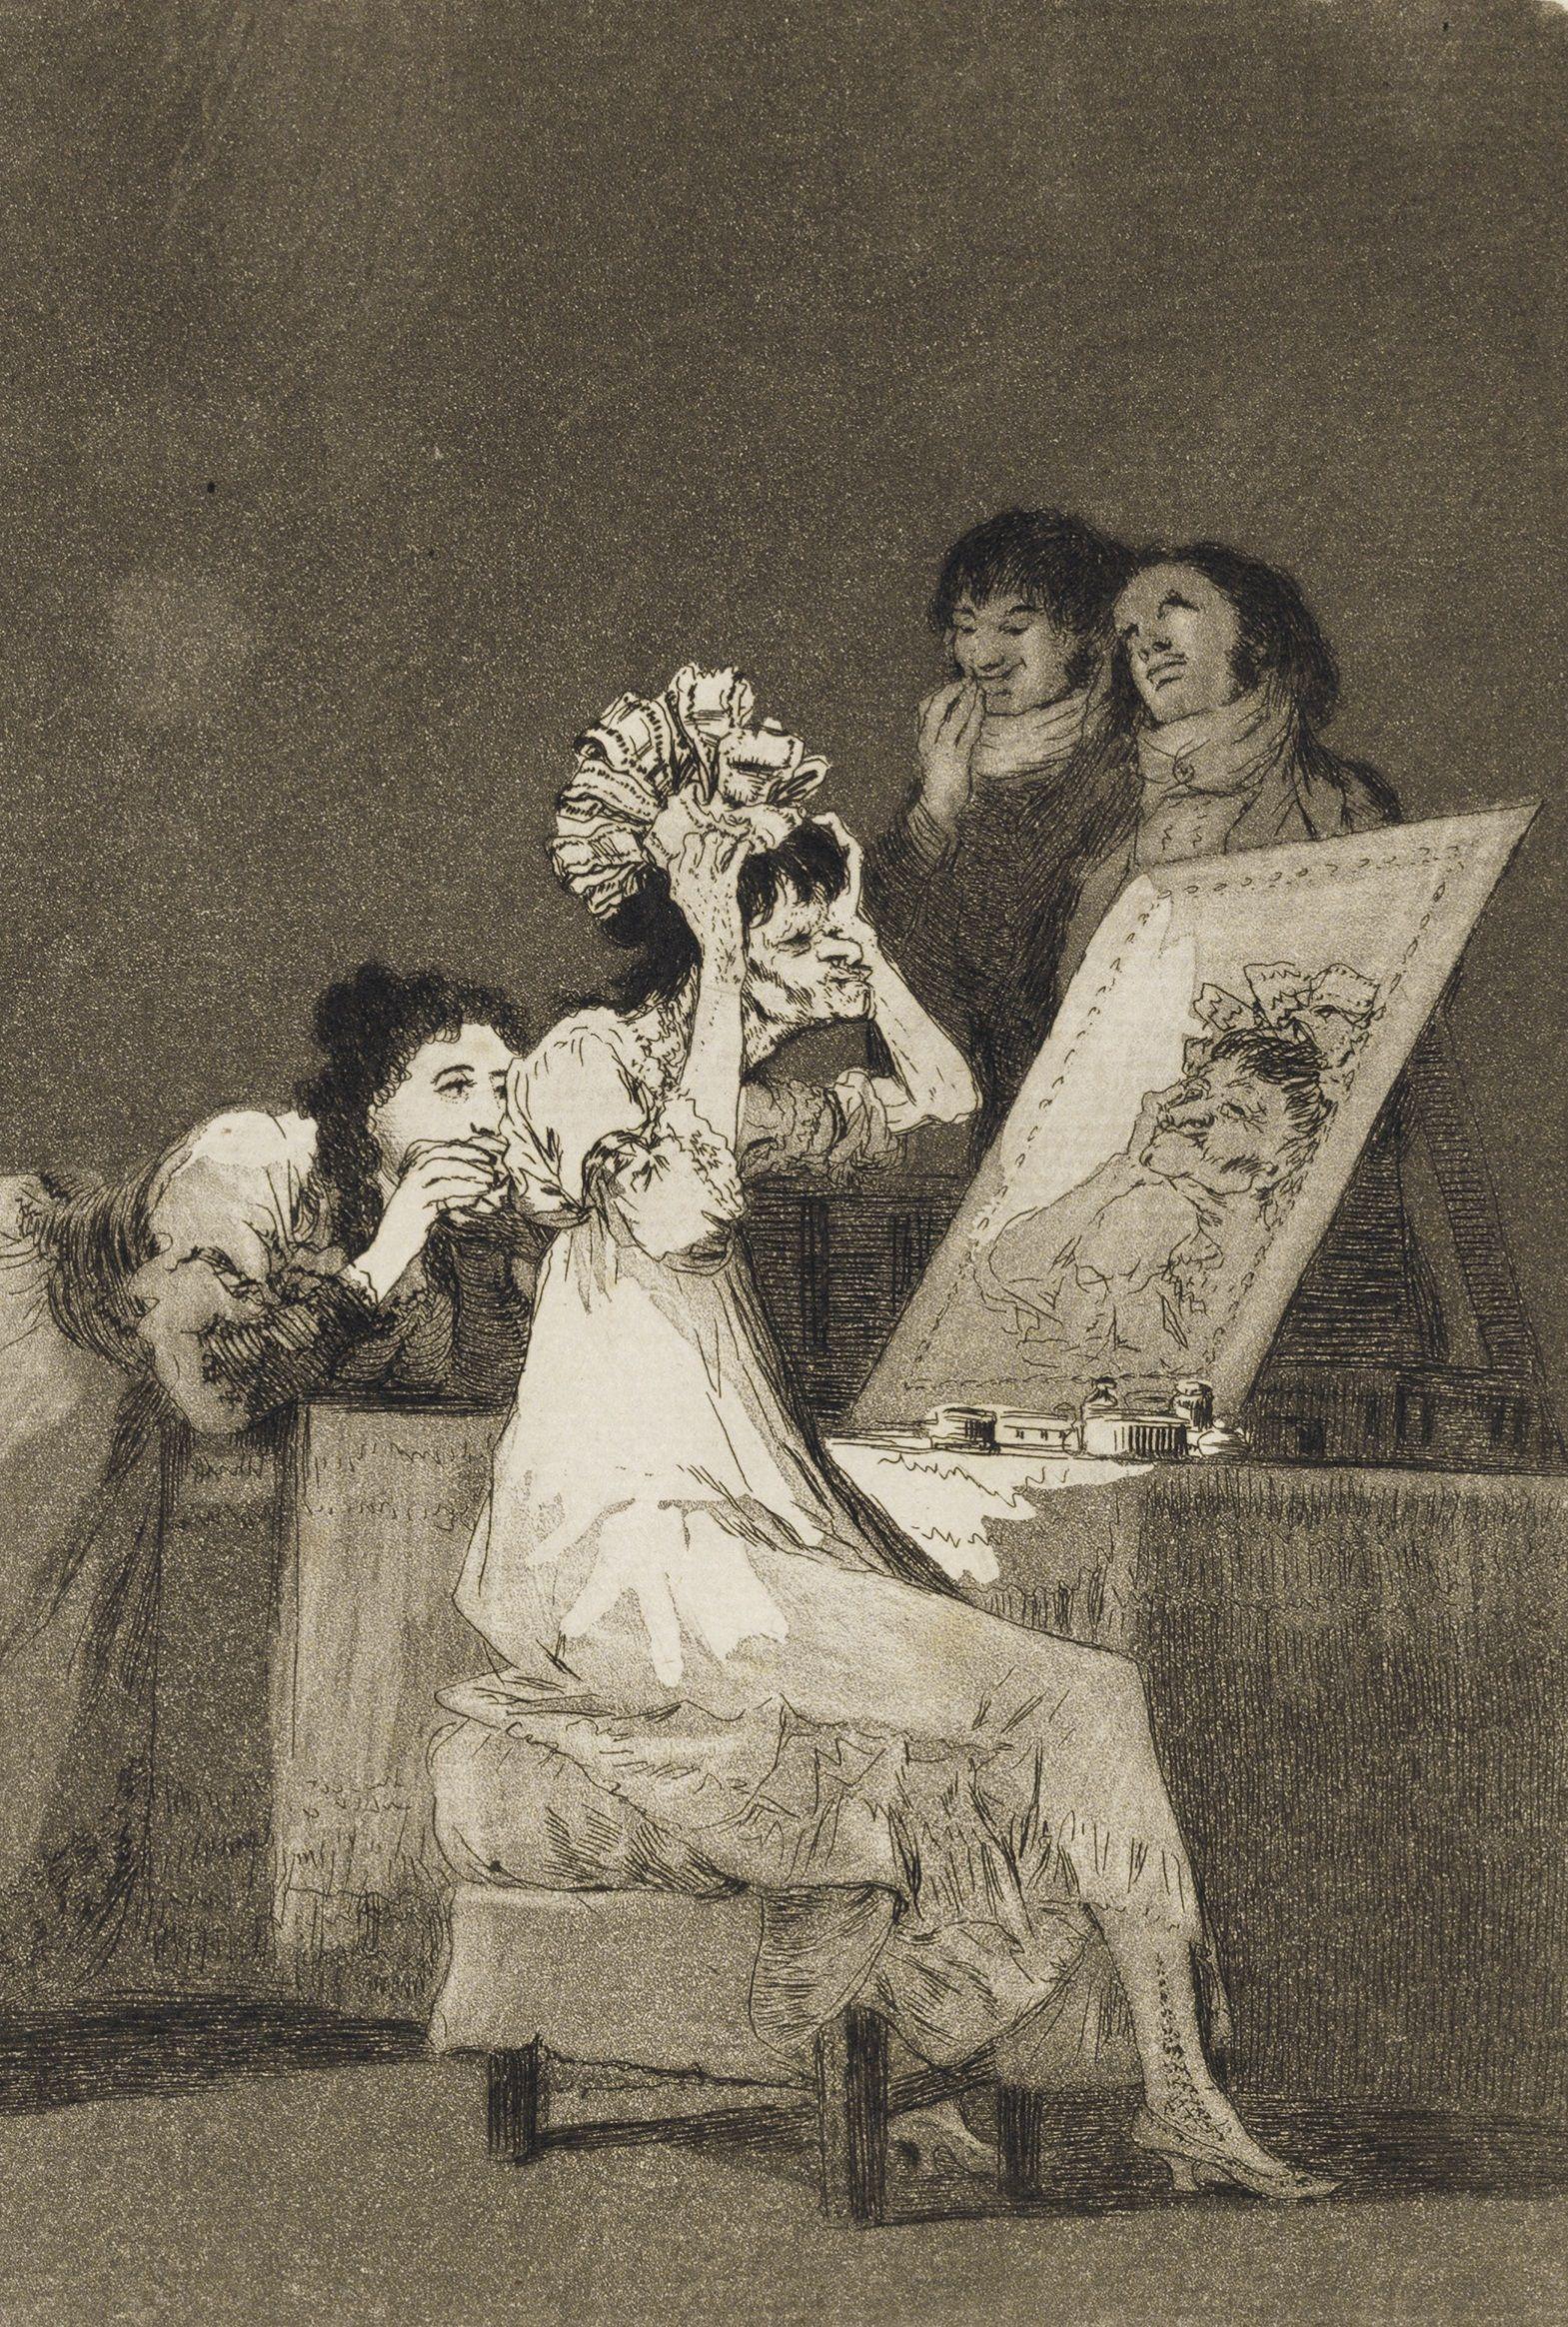 Francisco de Goya y Lucientes, Los Caprichos,  ©Christie's Images Ltd.